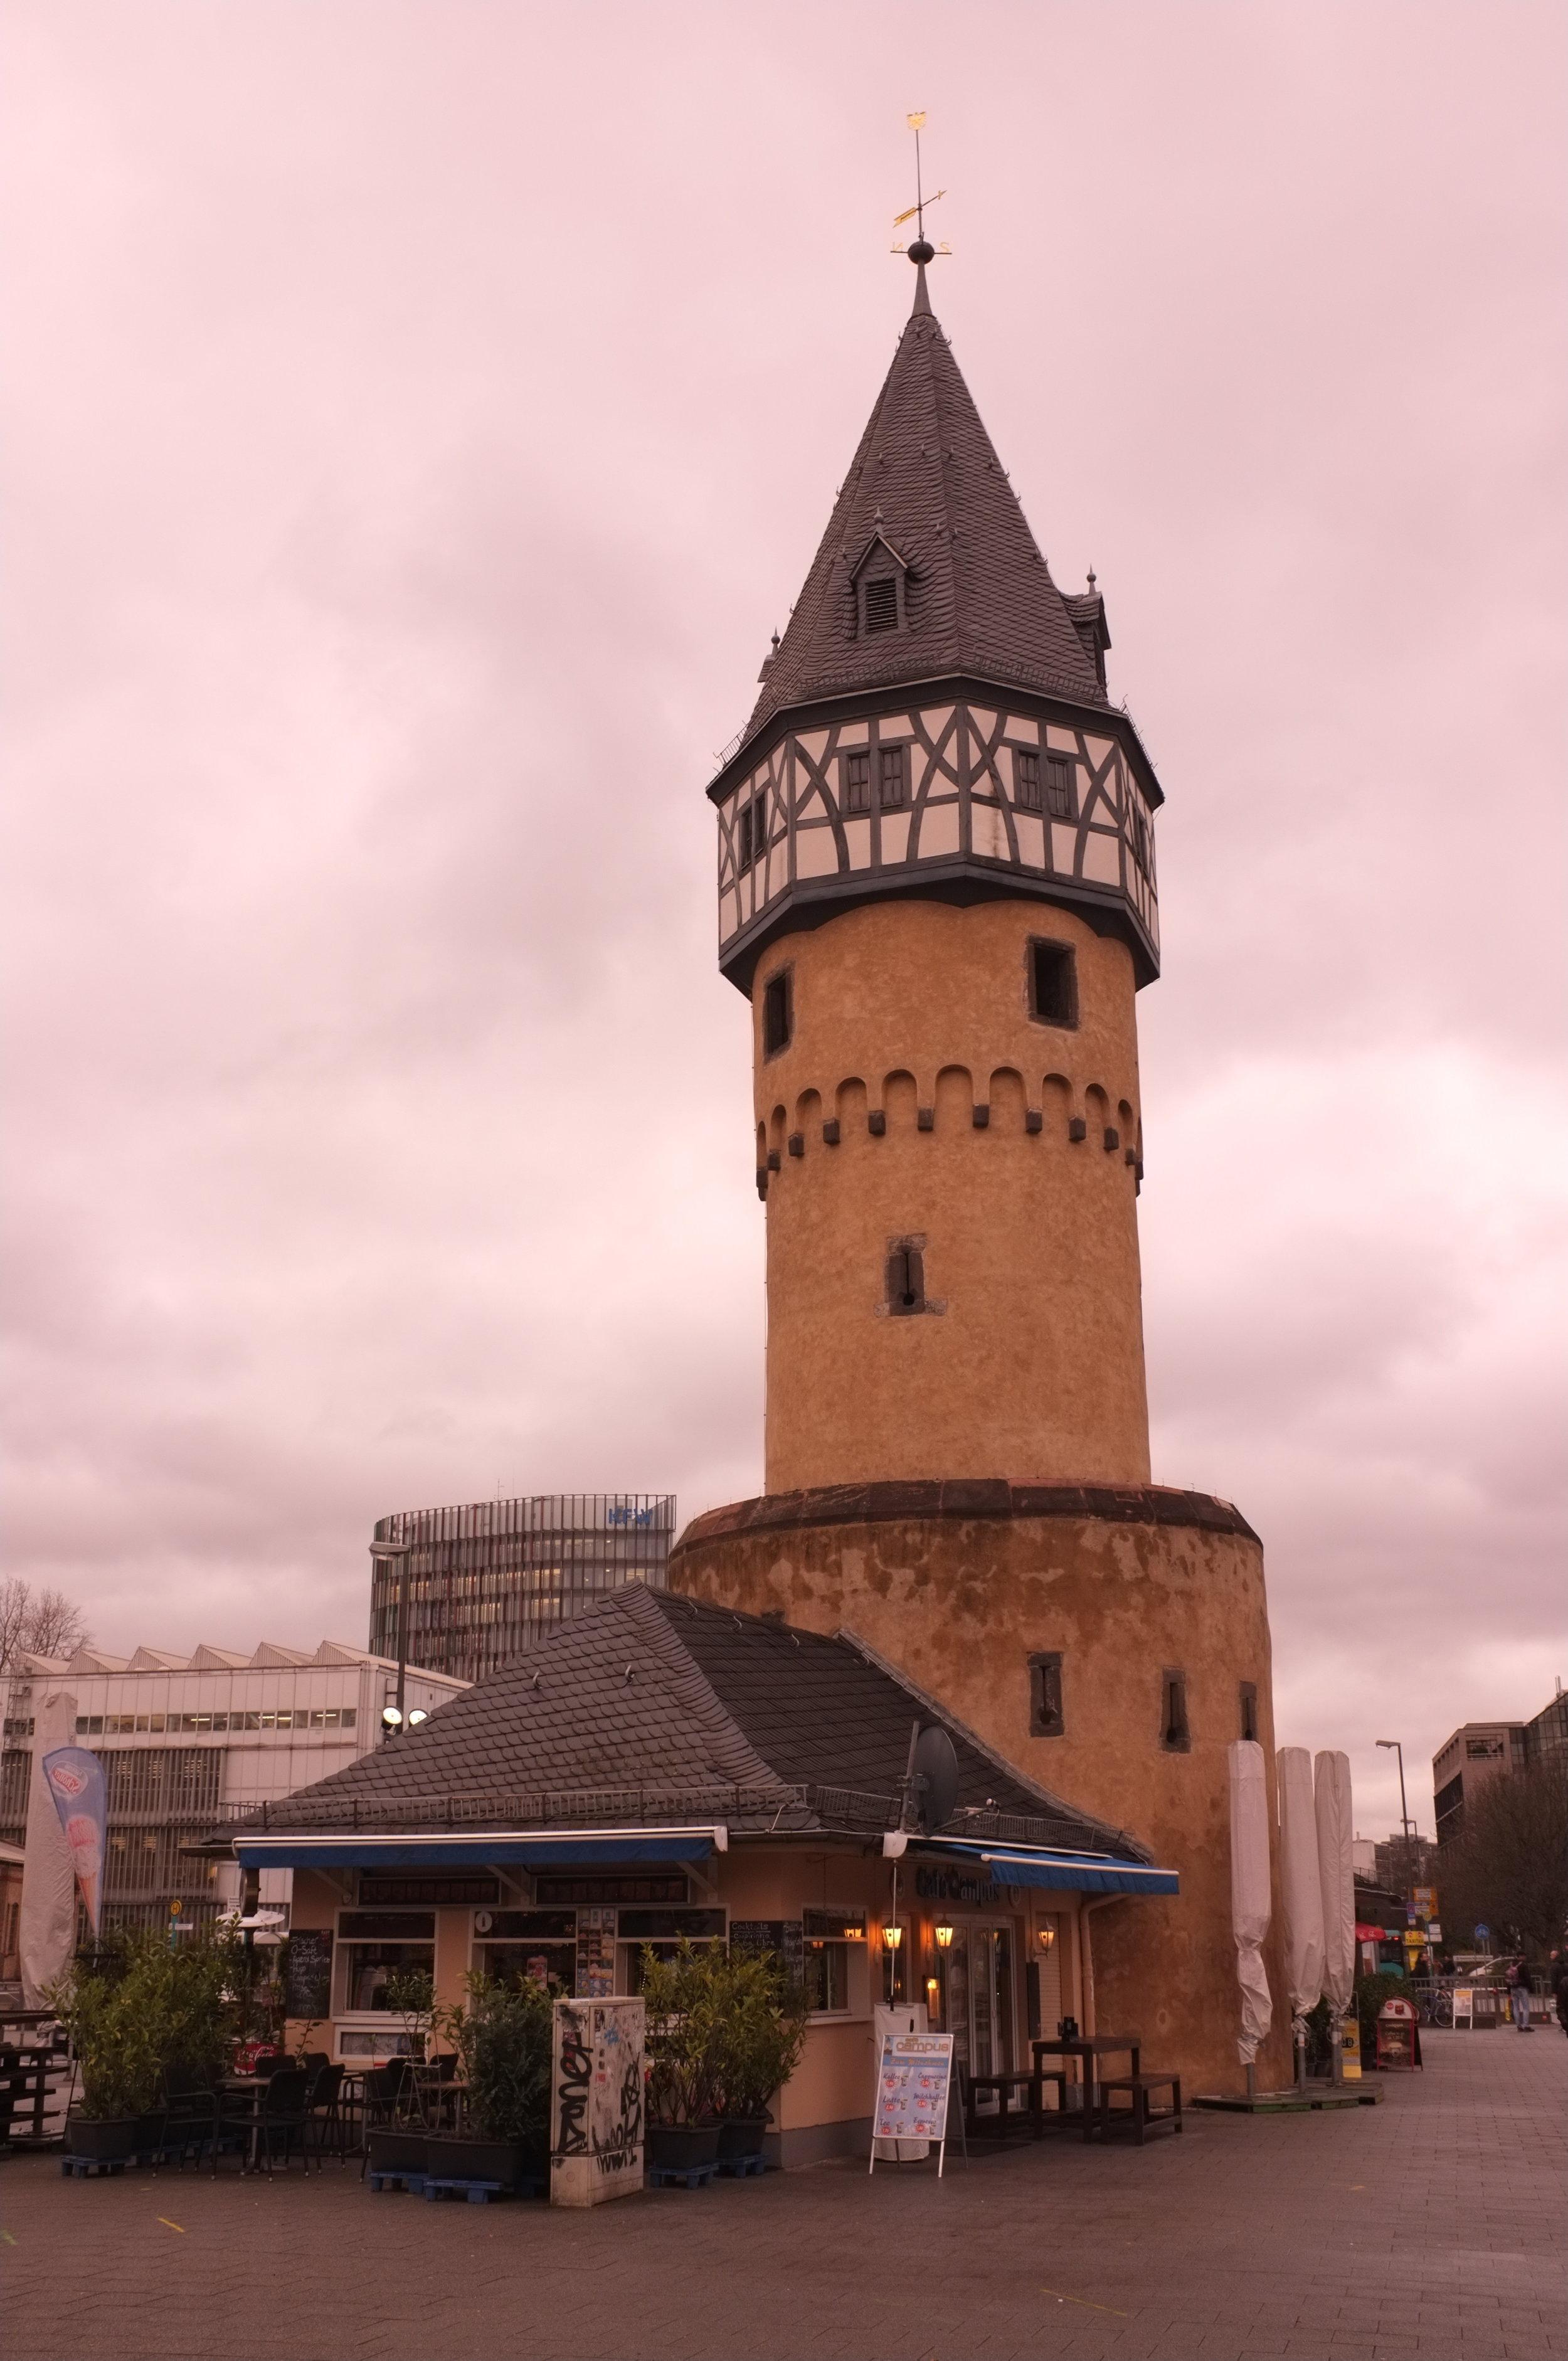 Bockenheimer Turm on a gloomy day.